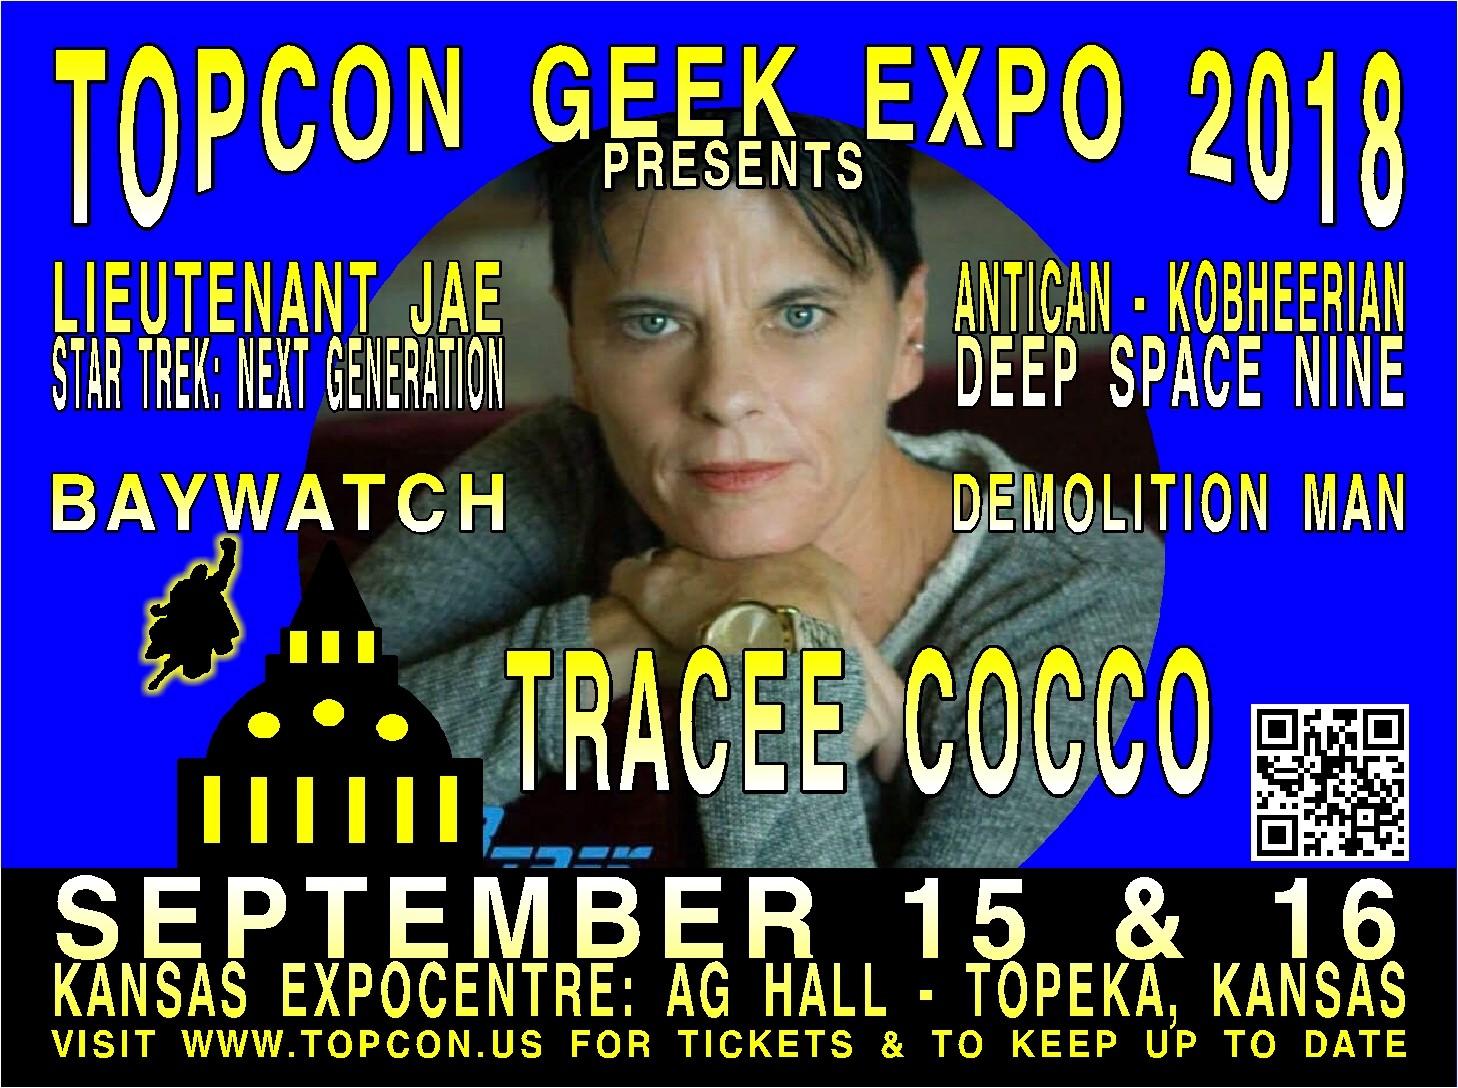 tracee cocco_1533829666829.jpg.jpg